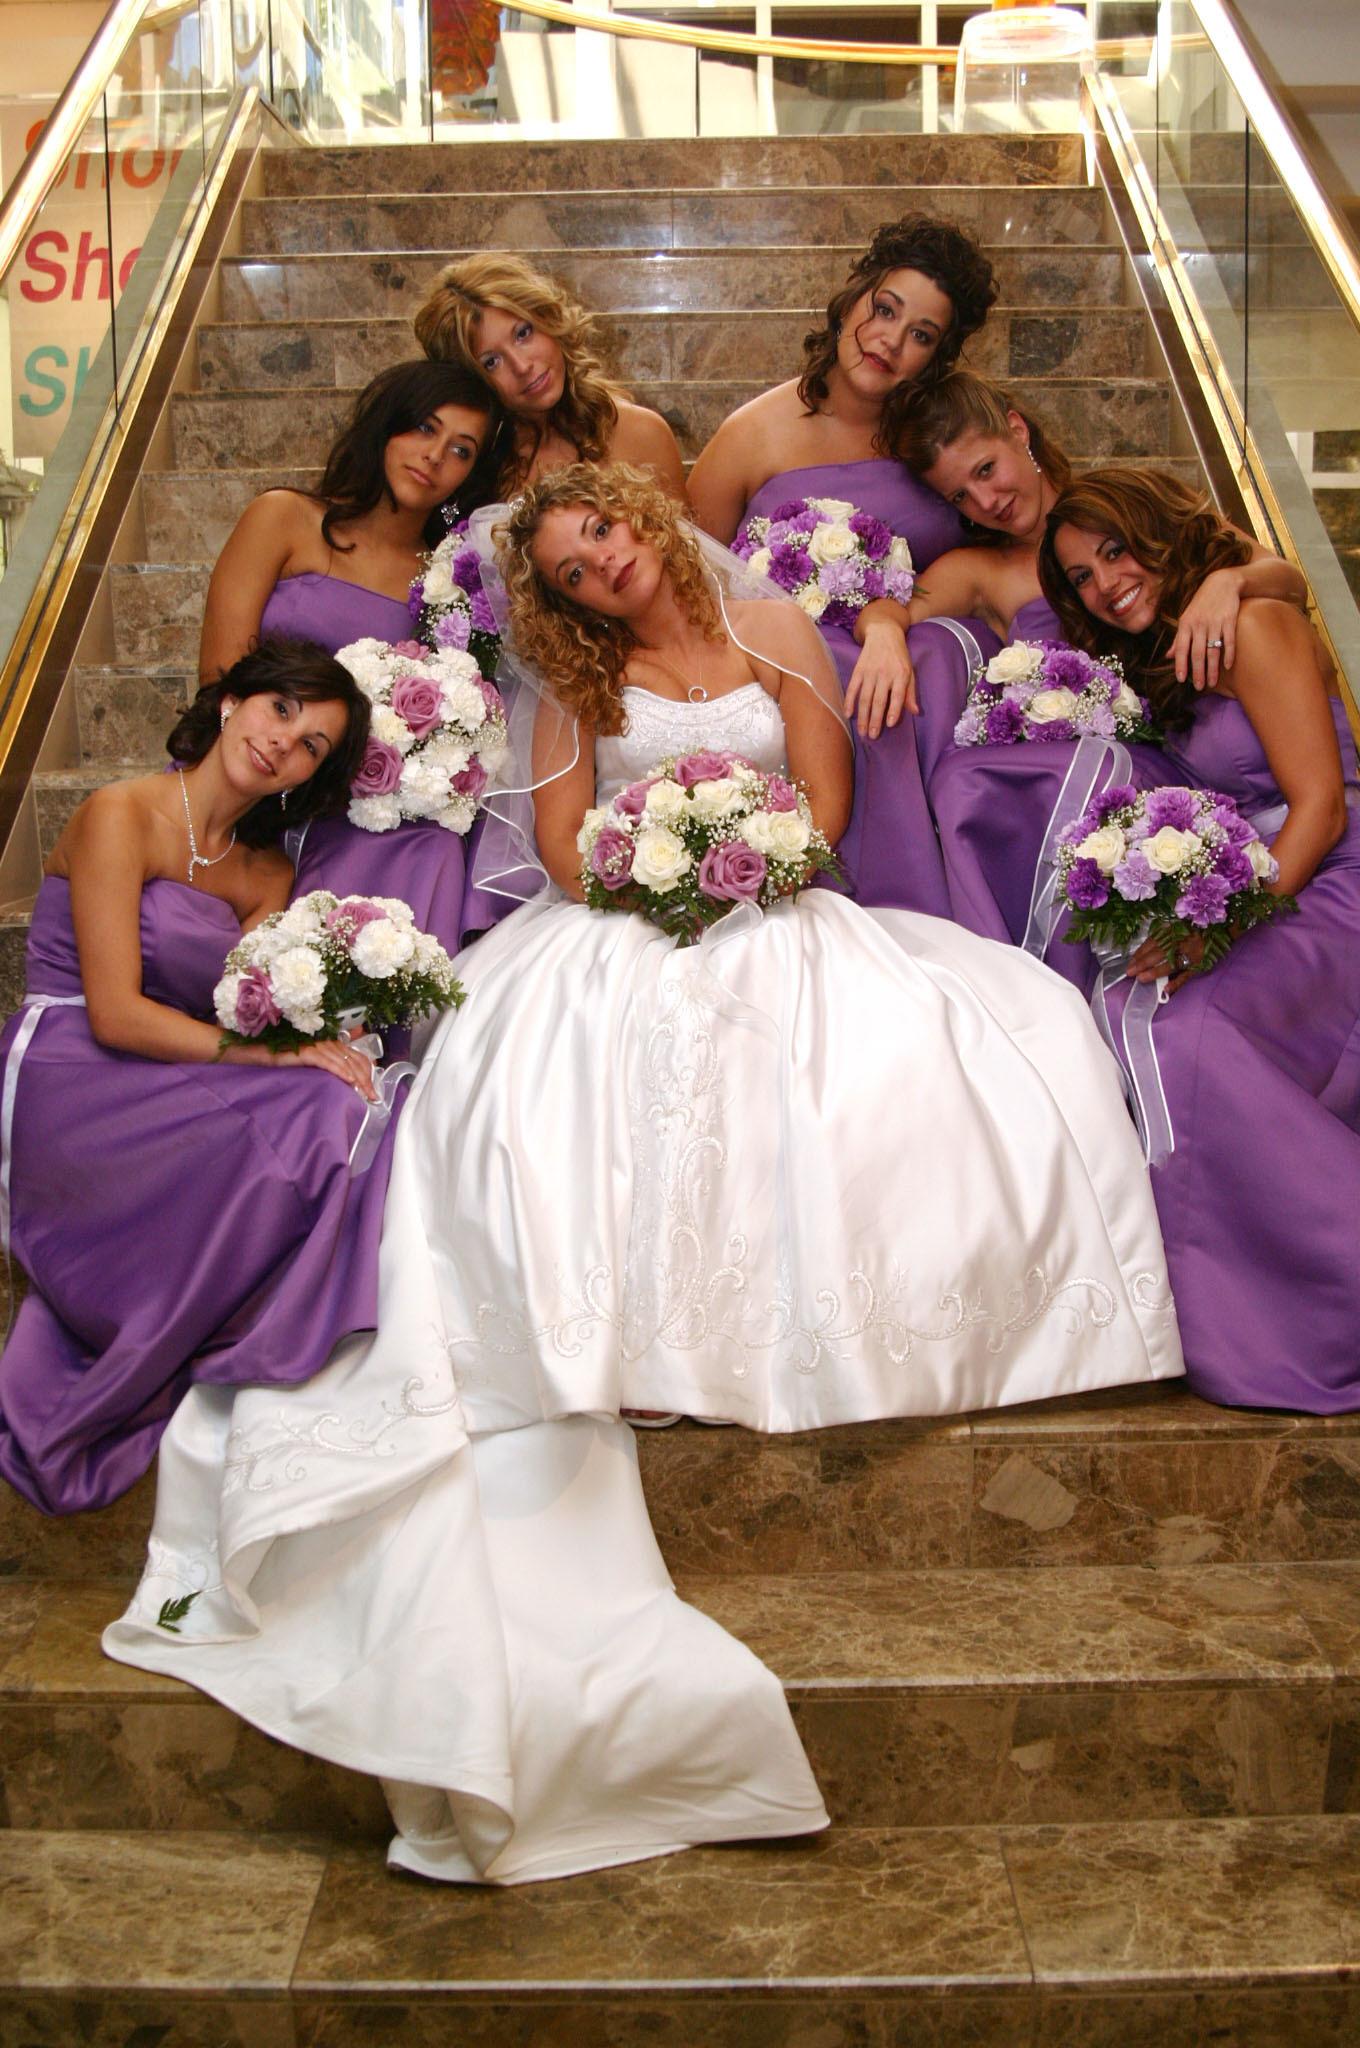 Bridesmaids, Bridesmaids Dresses, Fashion, Bride, Formal, Melissa anne photography, Formal Wedding Dresses